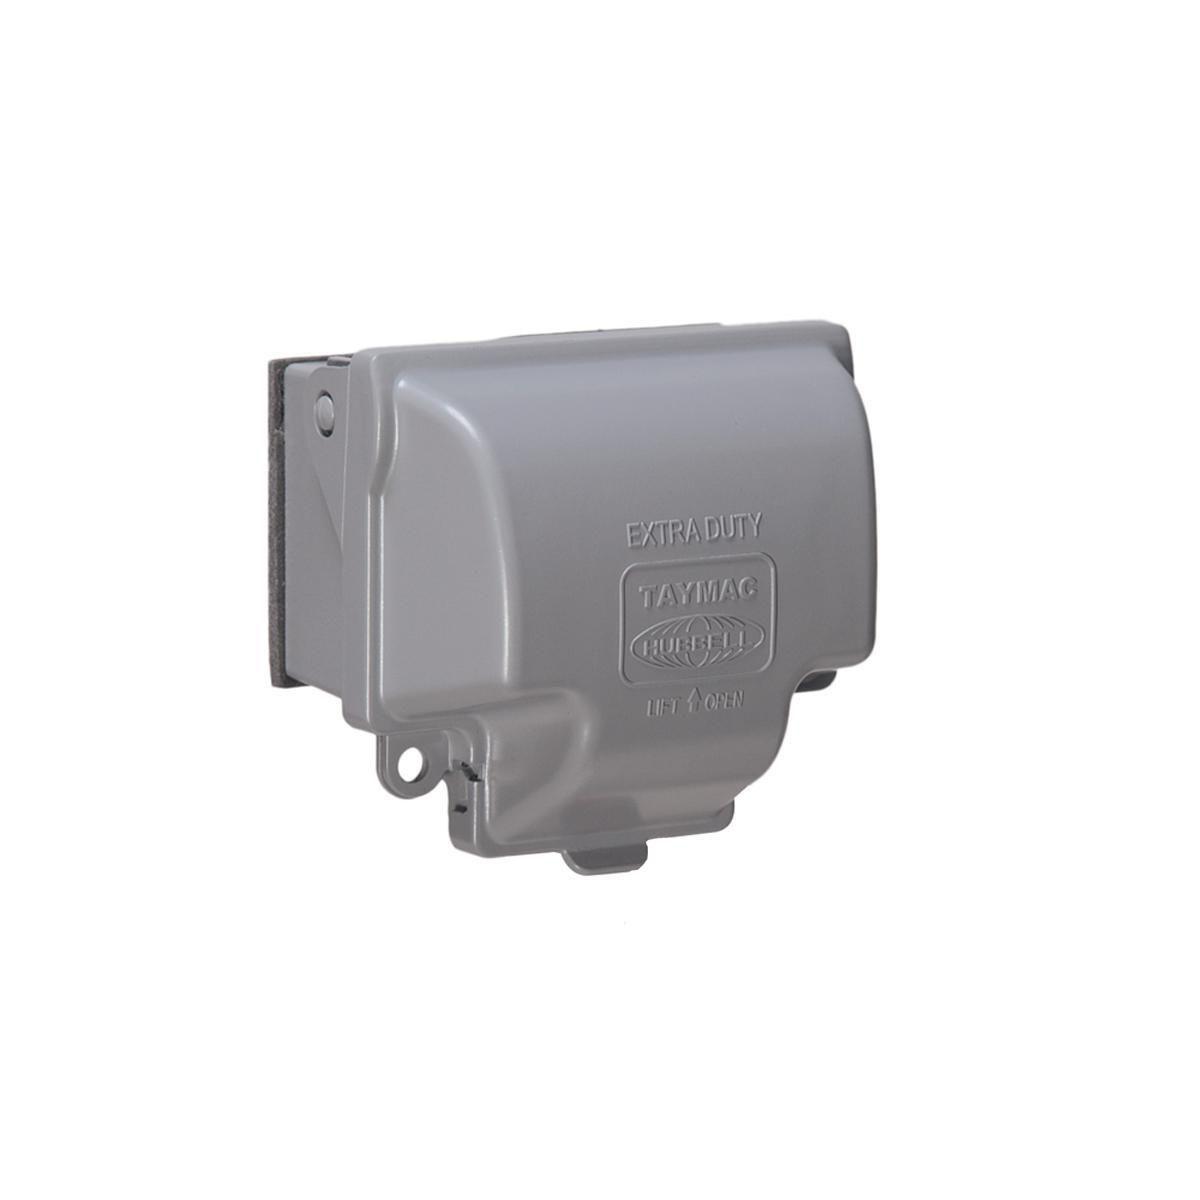 TMAC MX3300 METAL 8-IN-1 HORZ COVR EXTRA DUTY